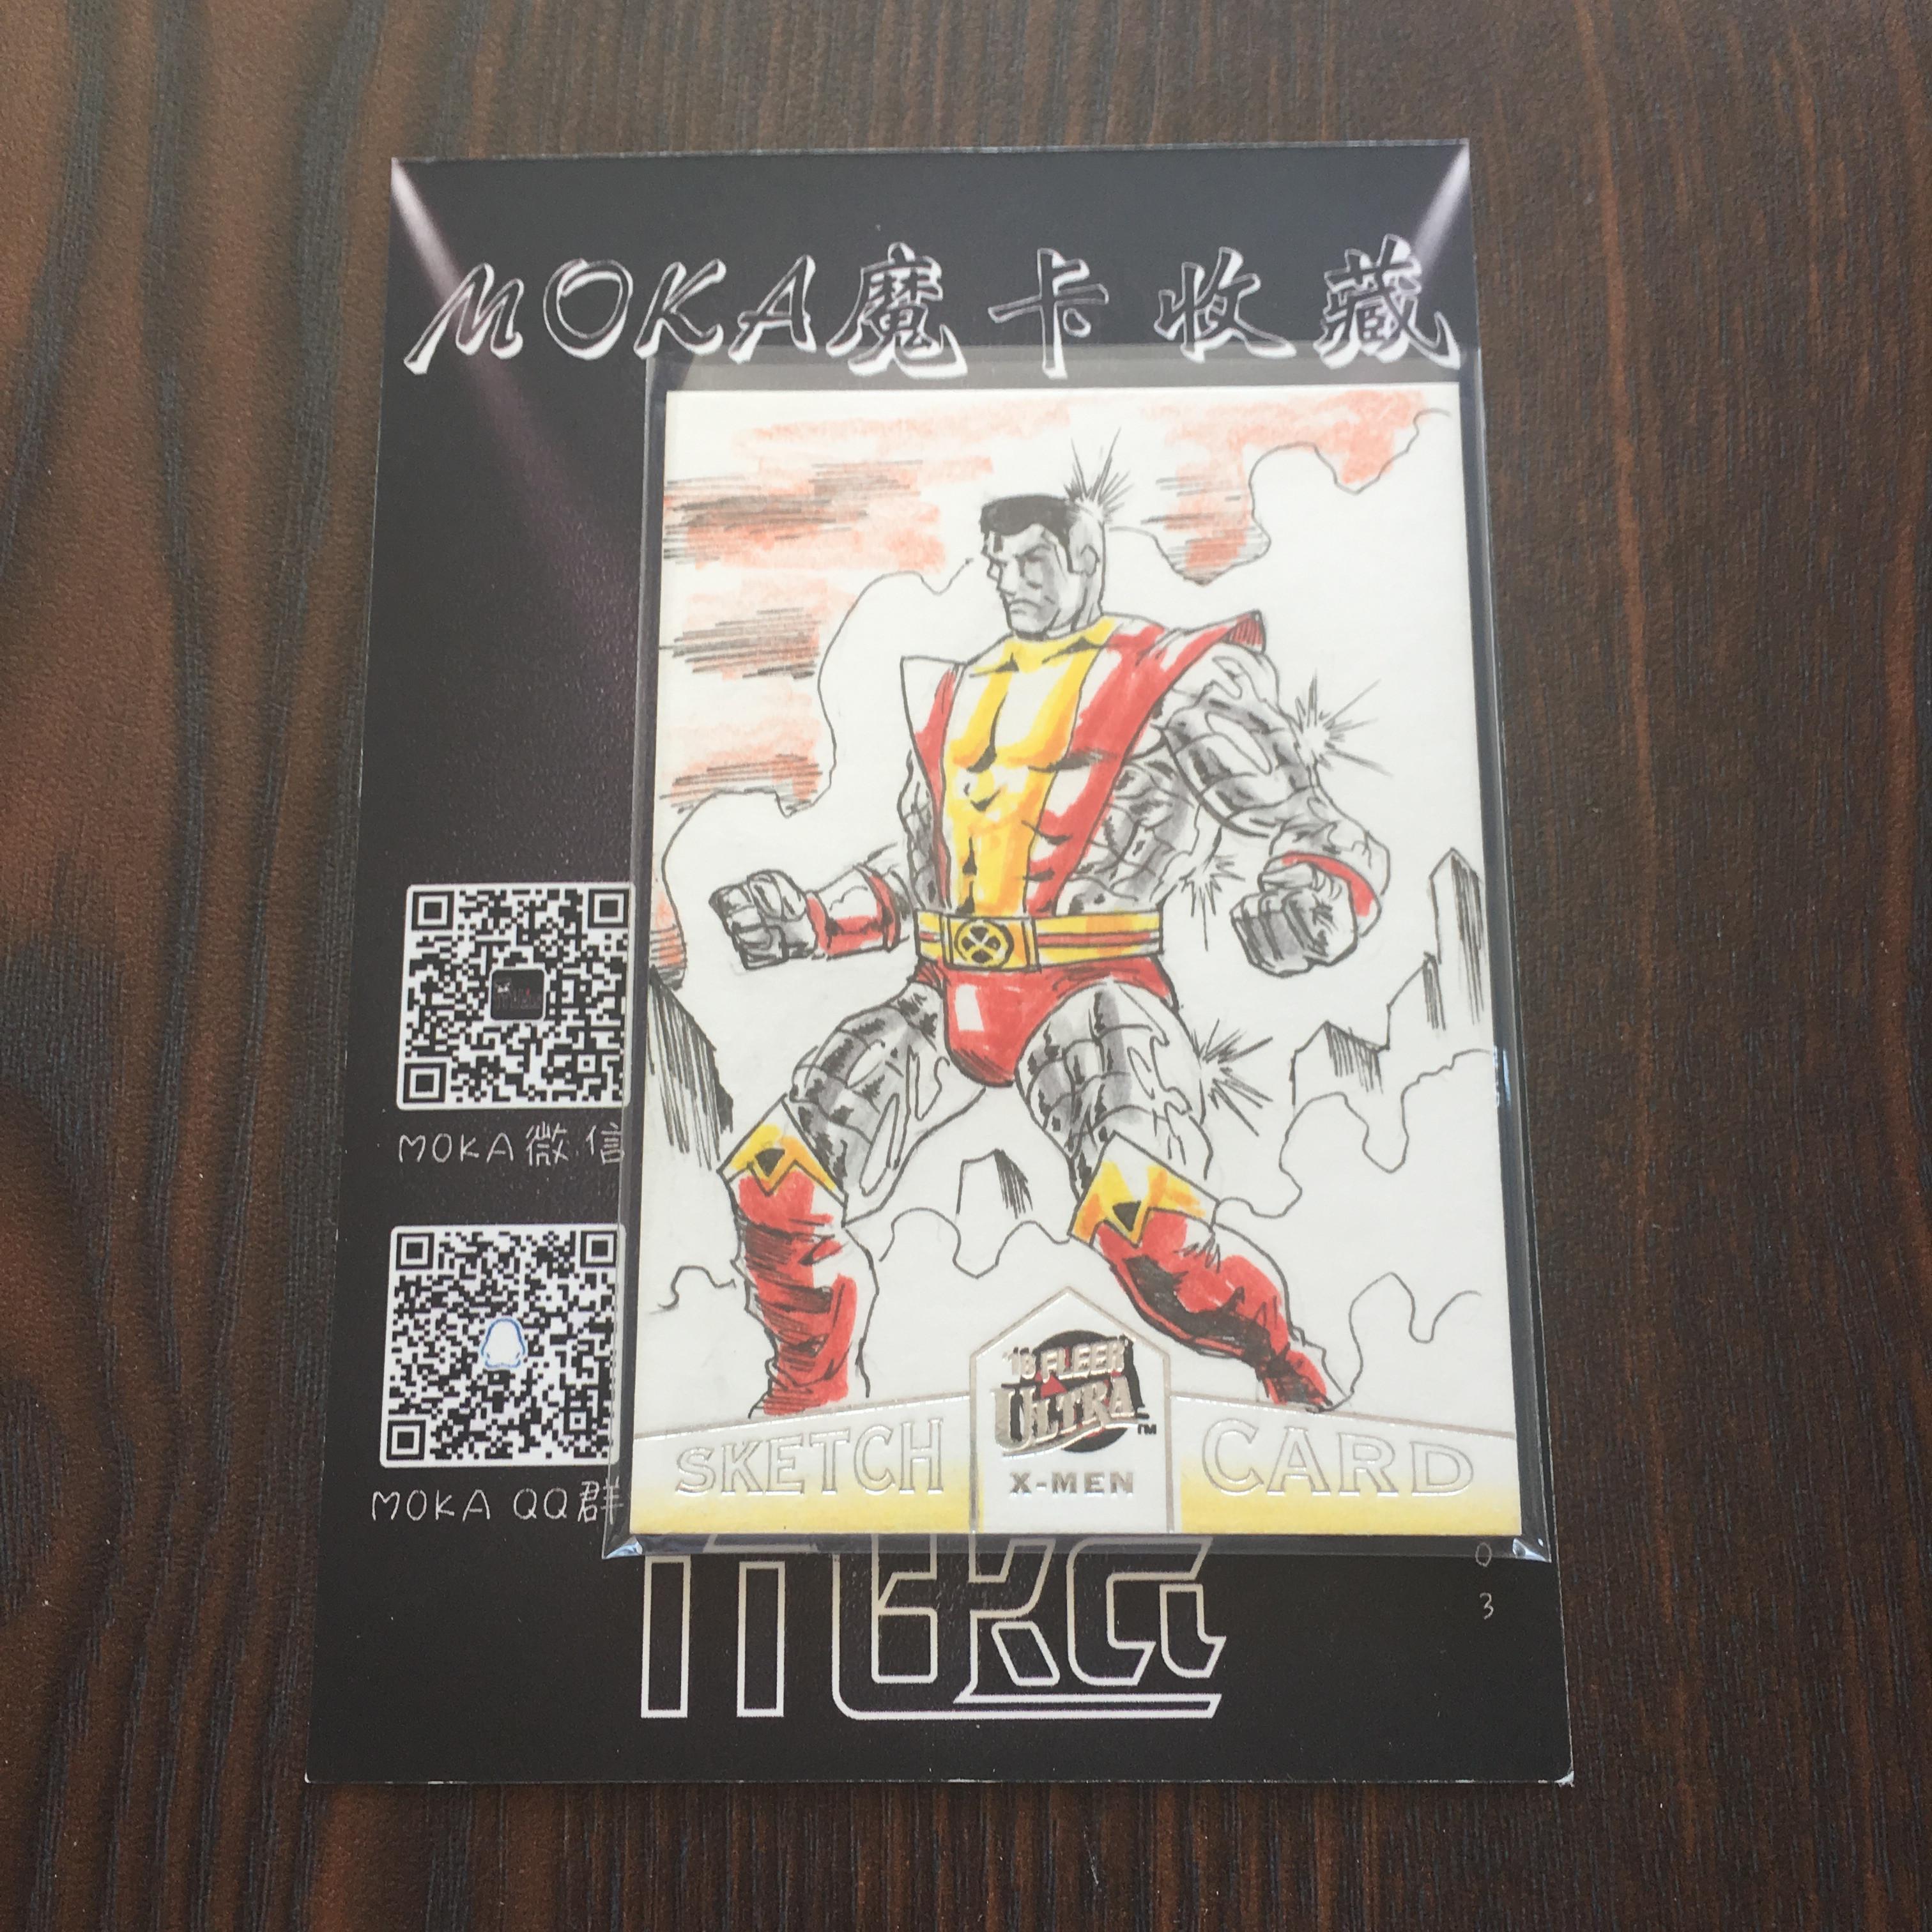 【MOKA球星卡收藏】#1804368 2018 Fleer X战警 手绘卡 艺术卡 1/1 一编 背面有画师签字